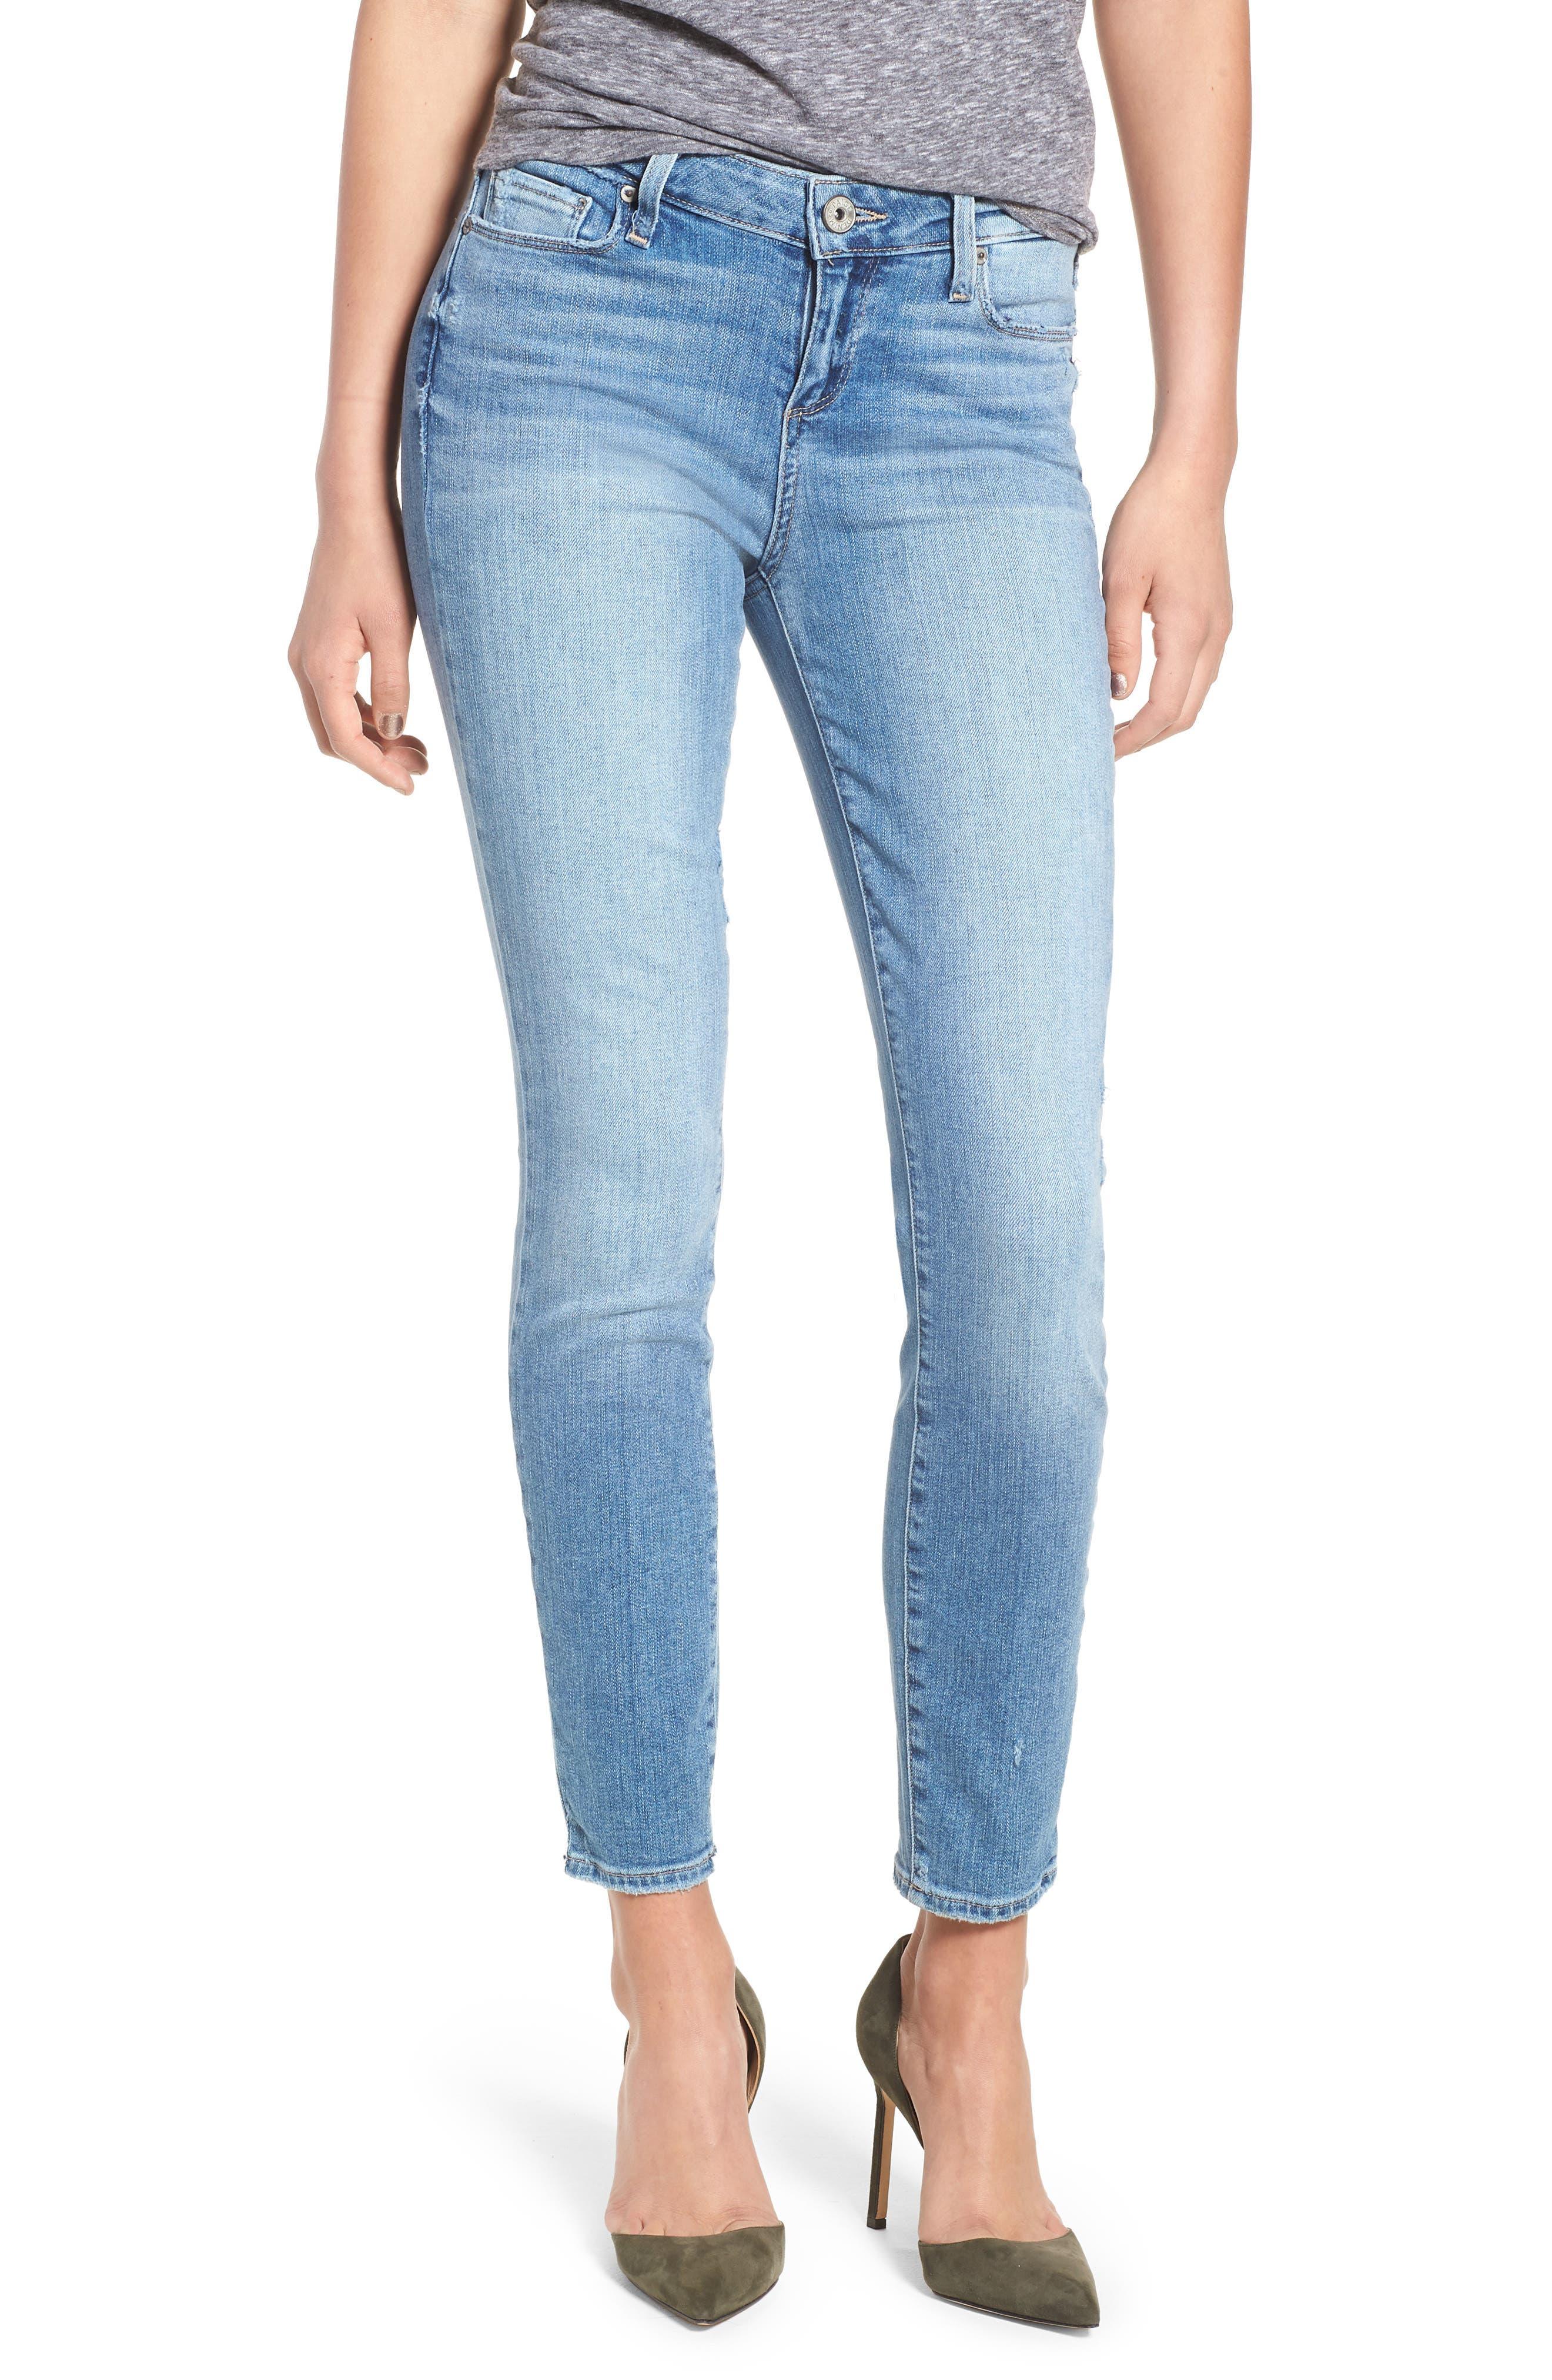 PAIGE Transcend - Verdugo Ankle Ultra Skinny Jeans (Soto)